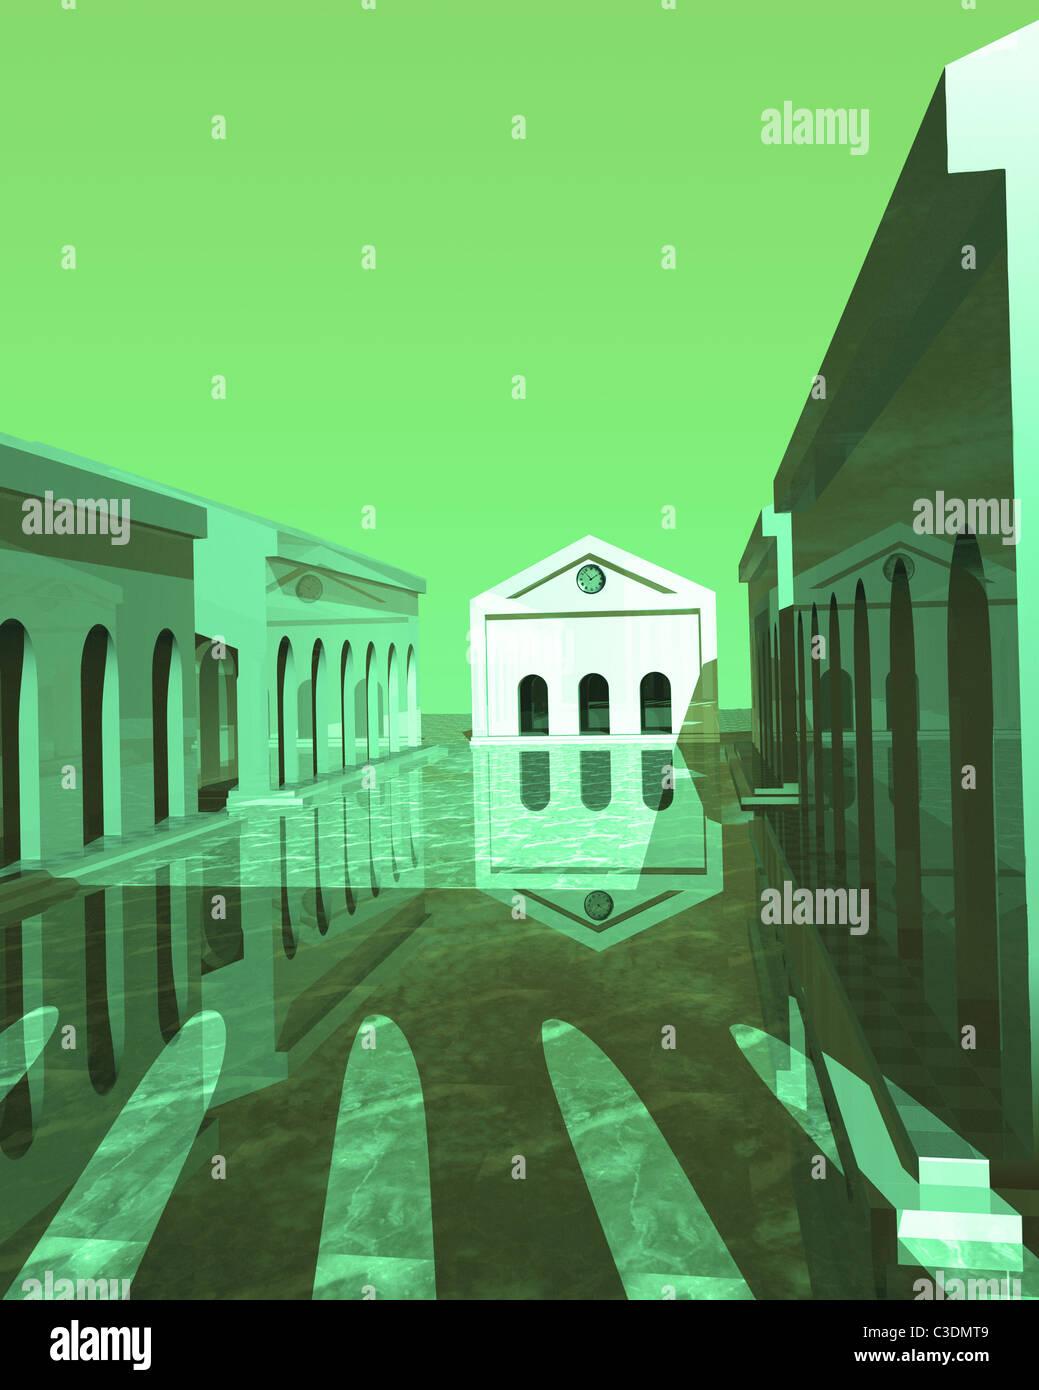 ACADEMIC BUILDINGS UNIVERSITY LEARNING ACADEMIA - Stock Image